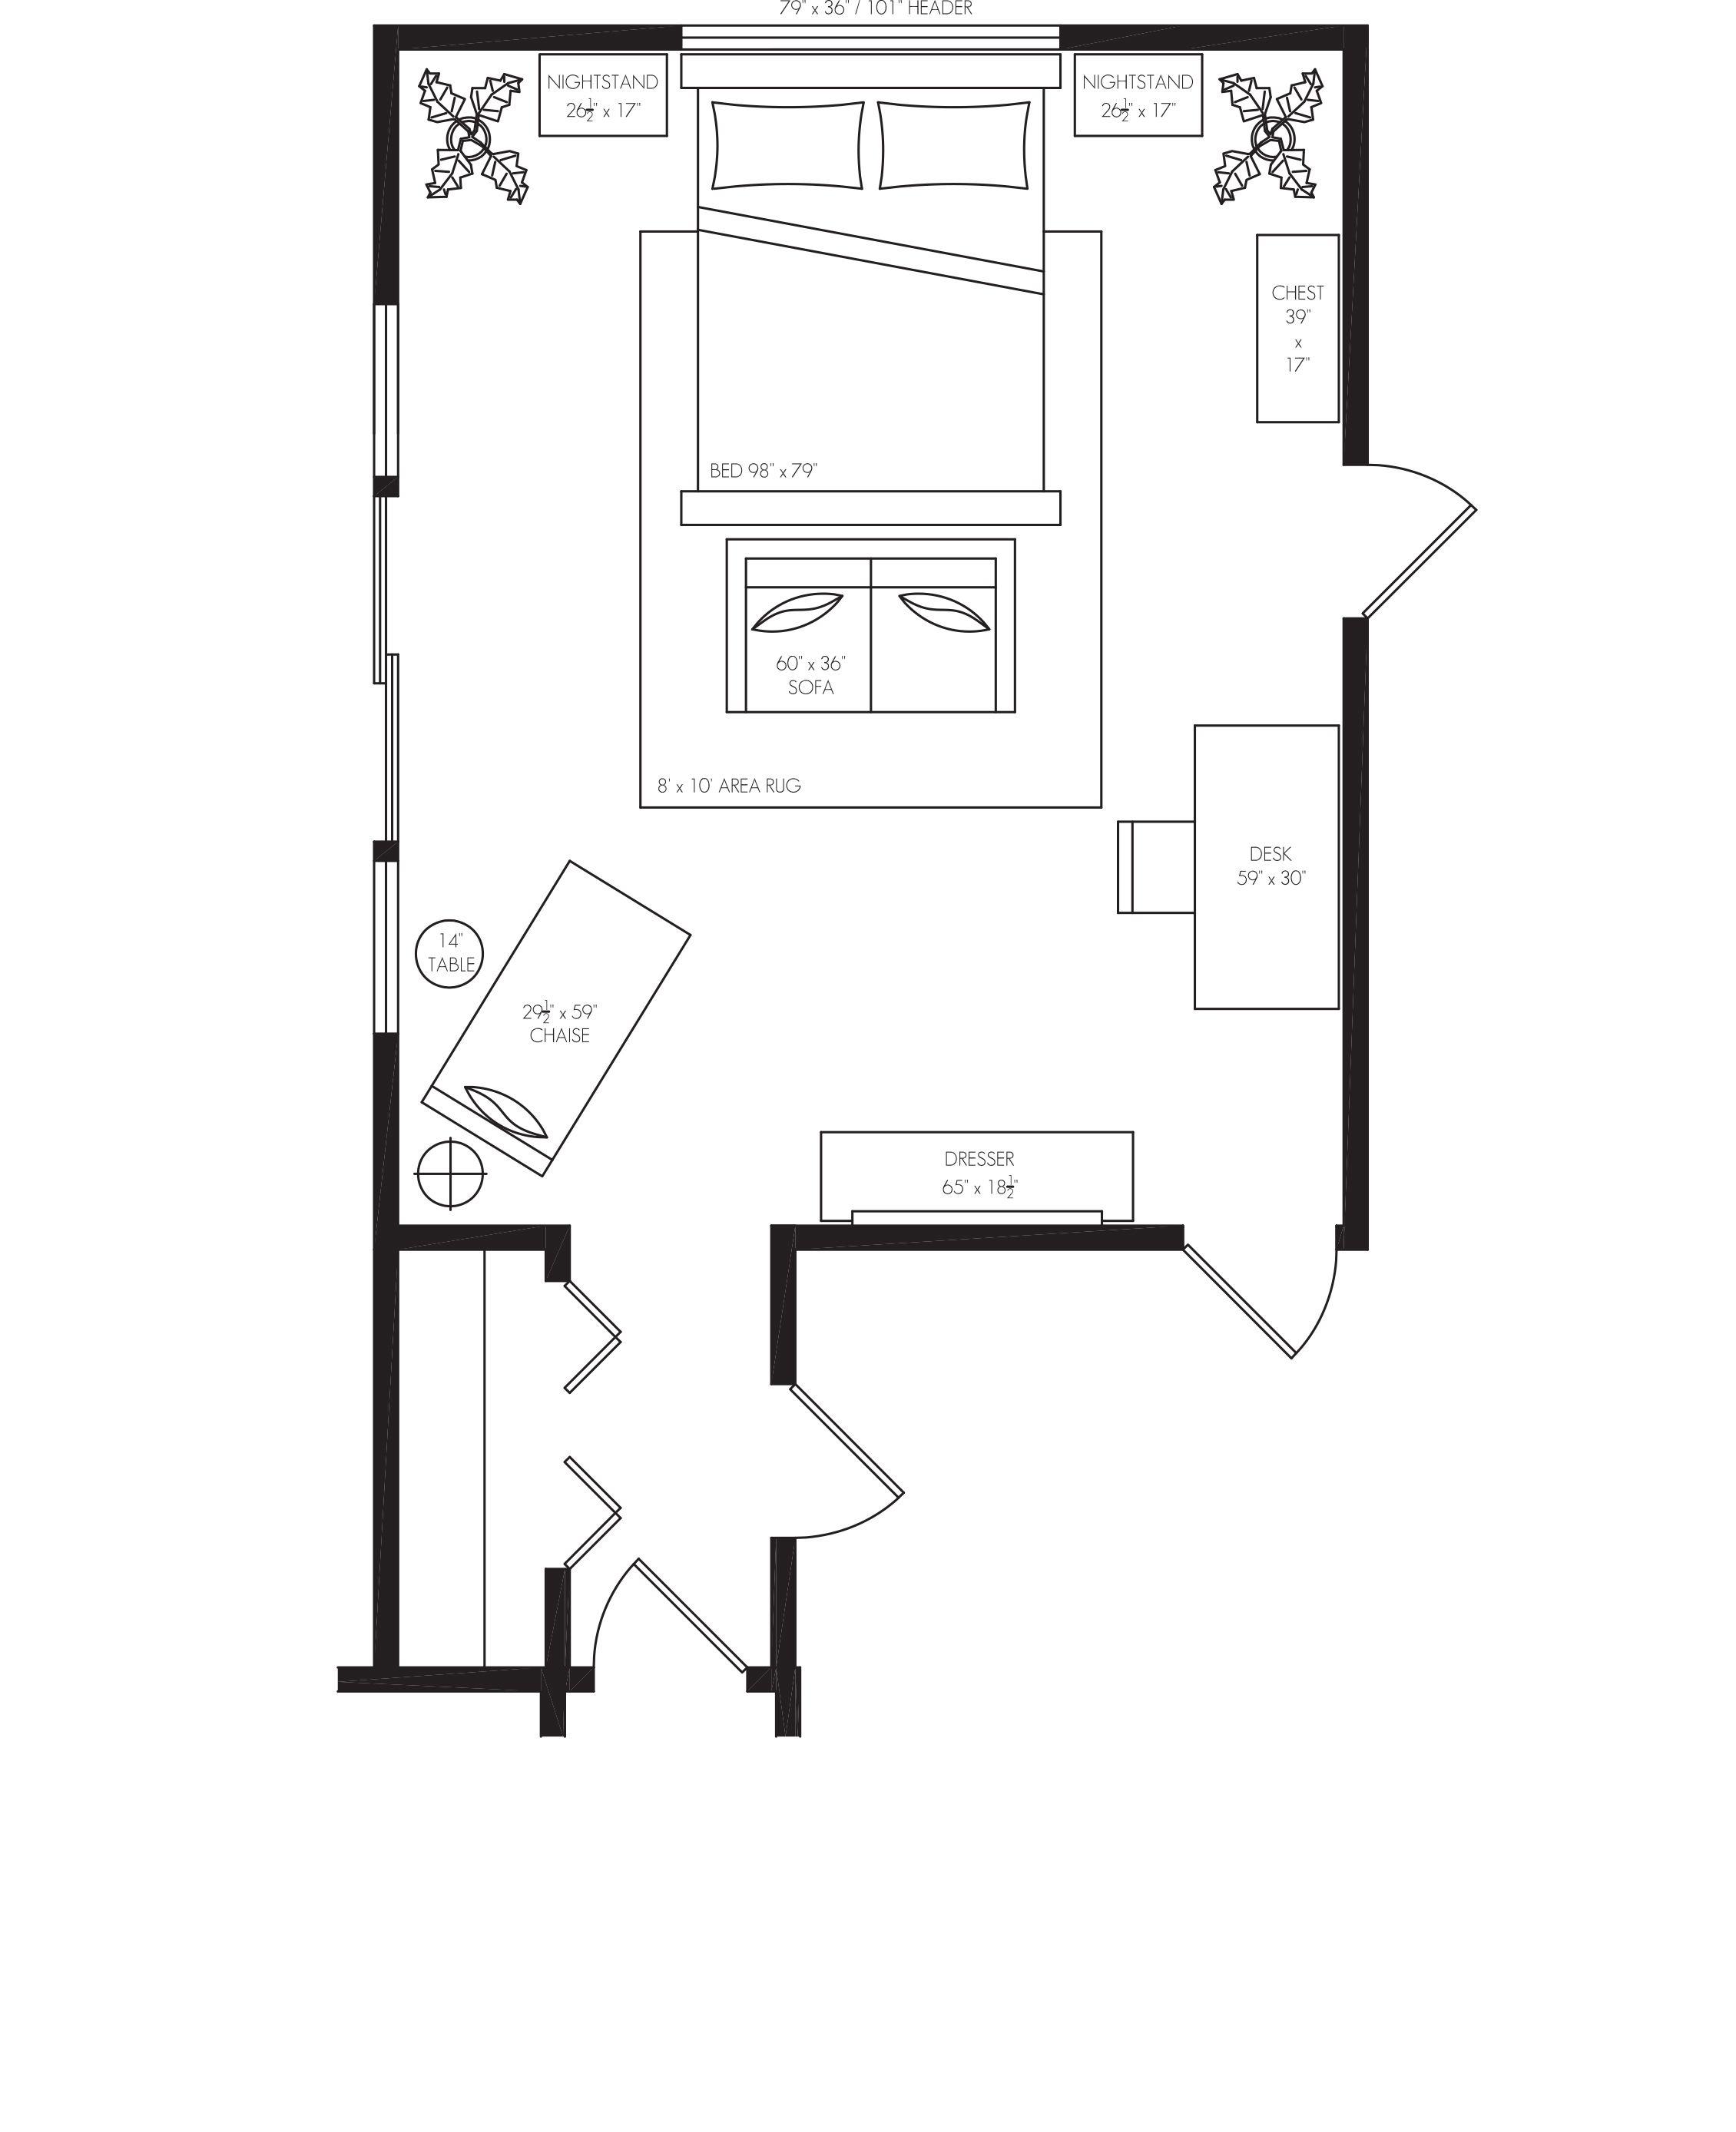 Master Bedroom Furniture Layout Santa Rita